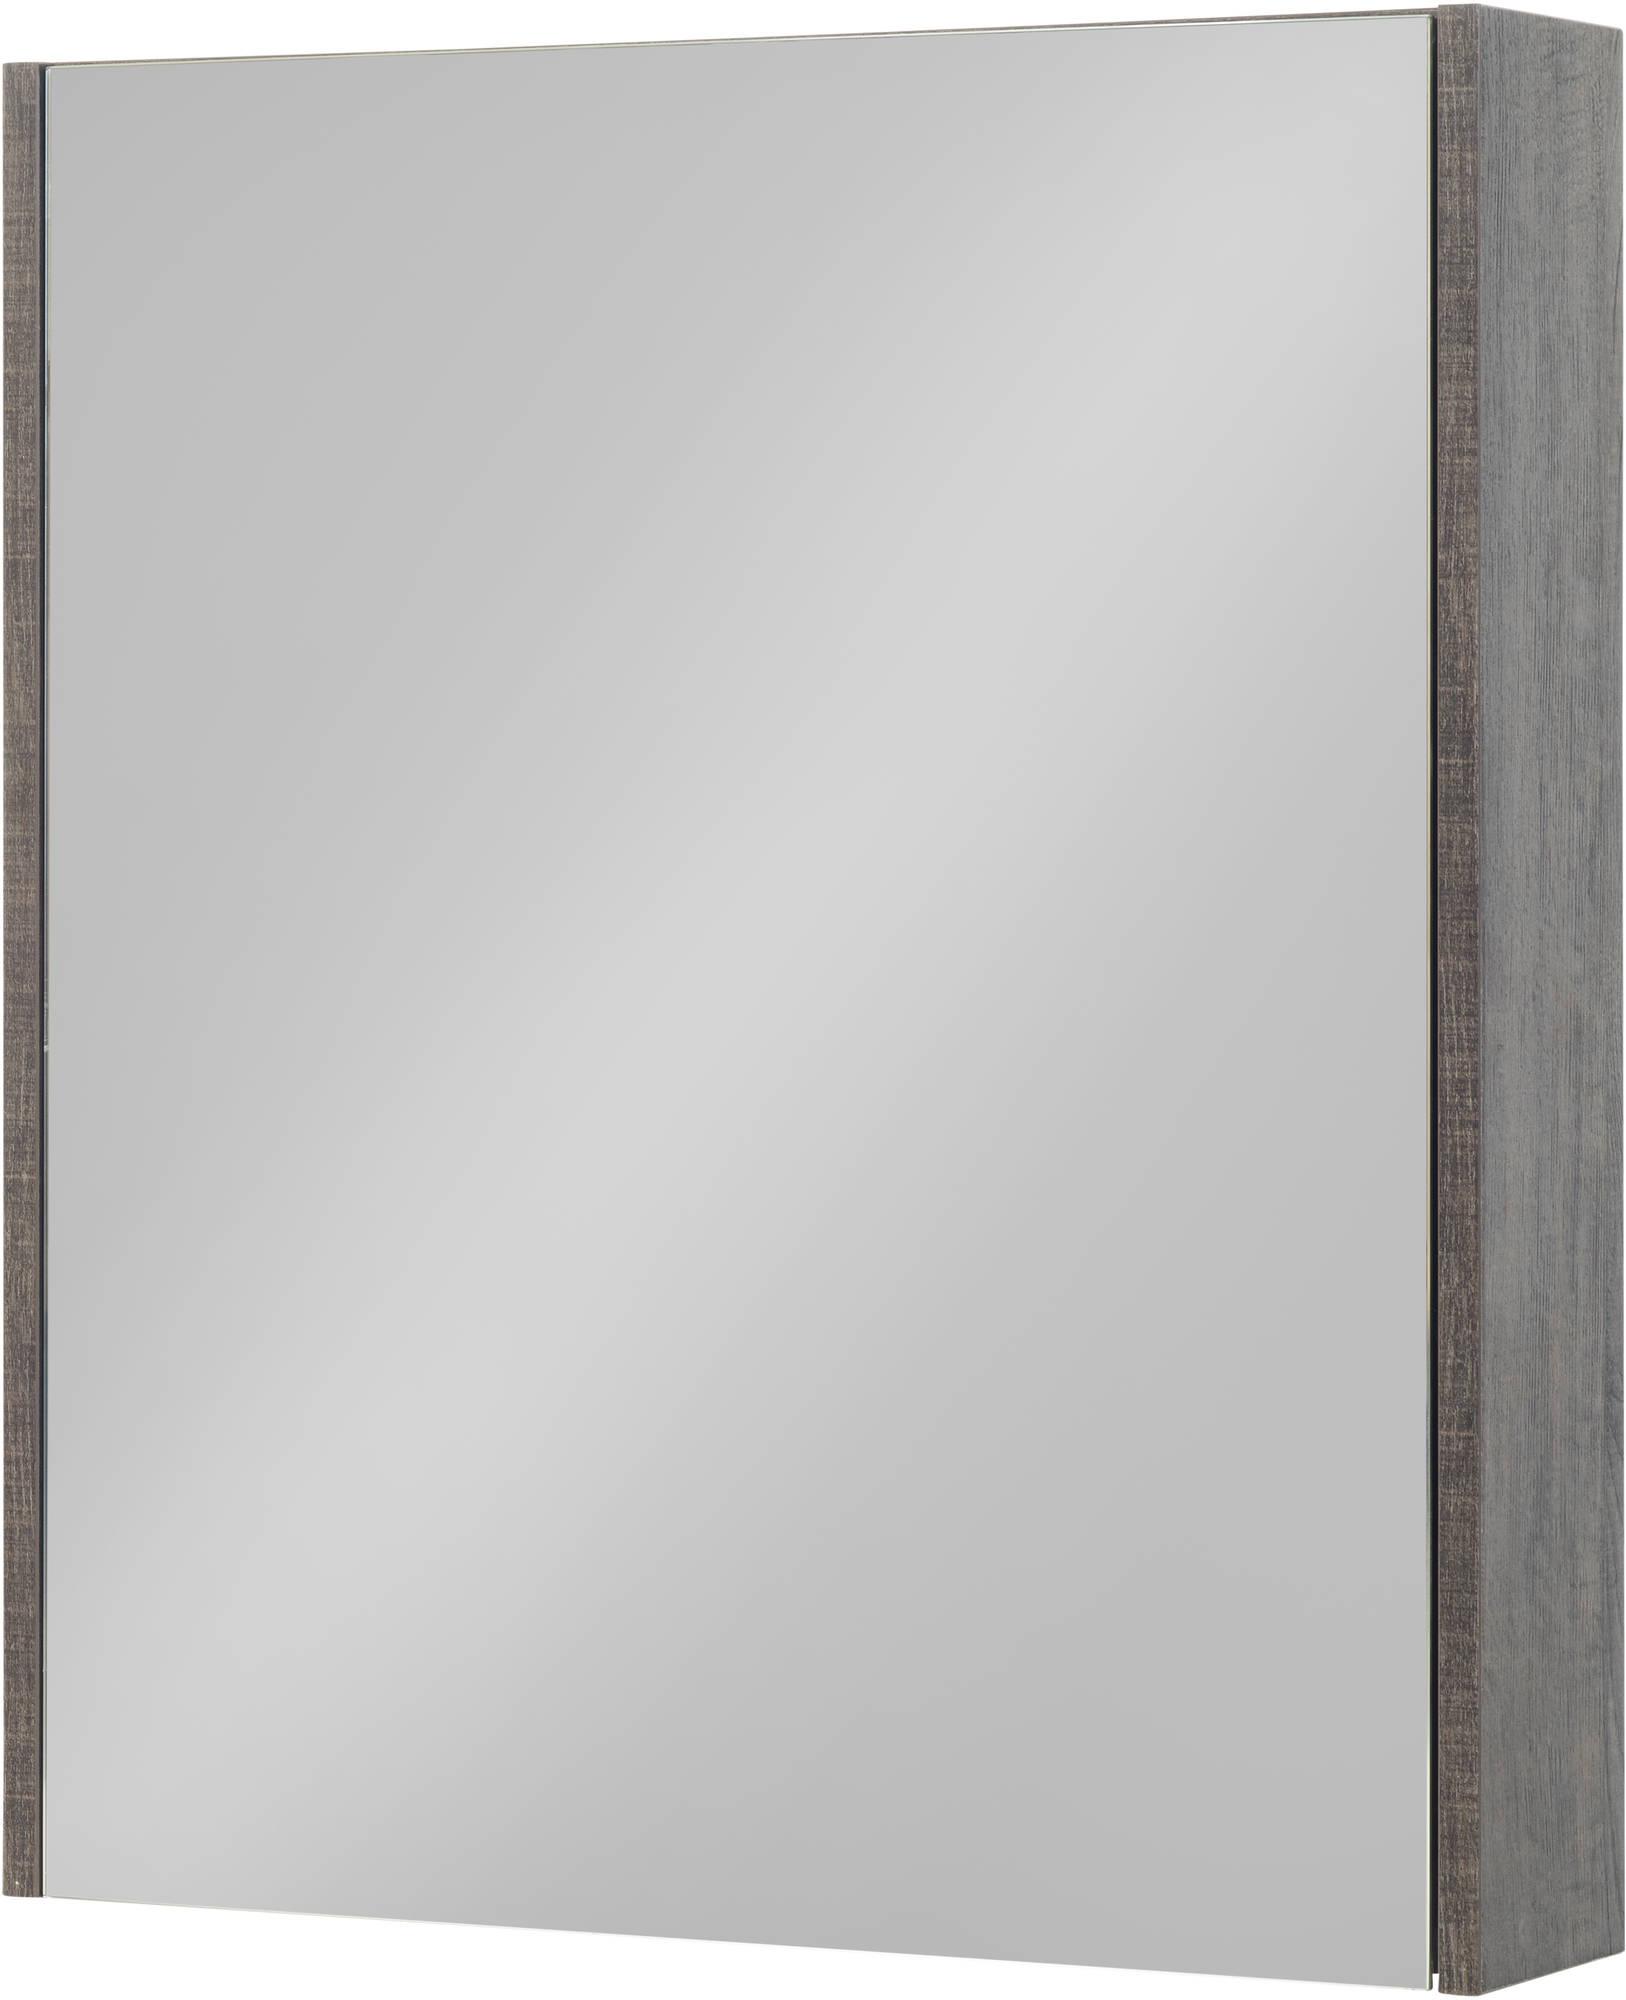 Saniselect Socan Spiegelkast 60x14x70 cm Kasteel Bruin